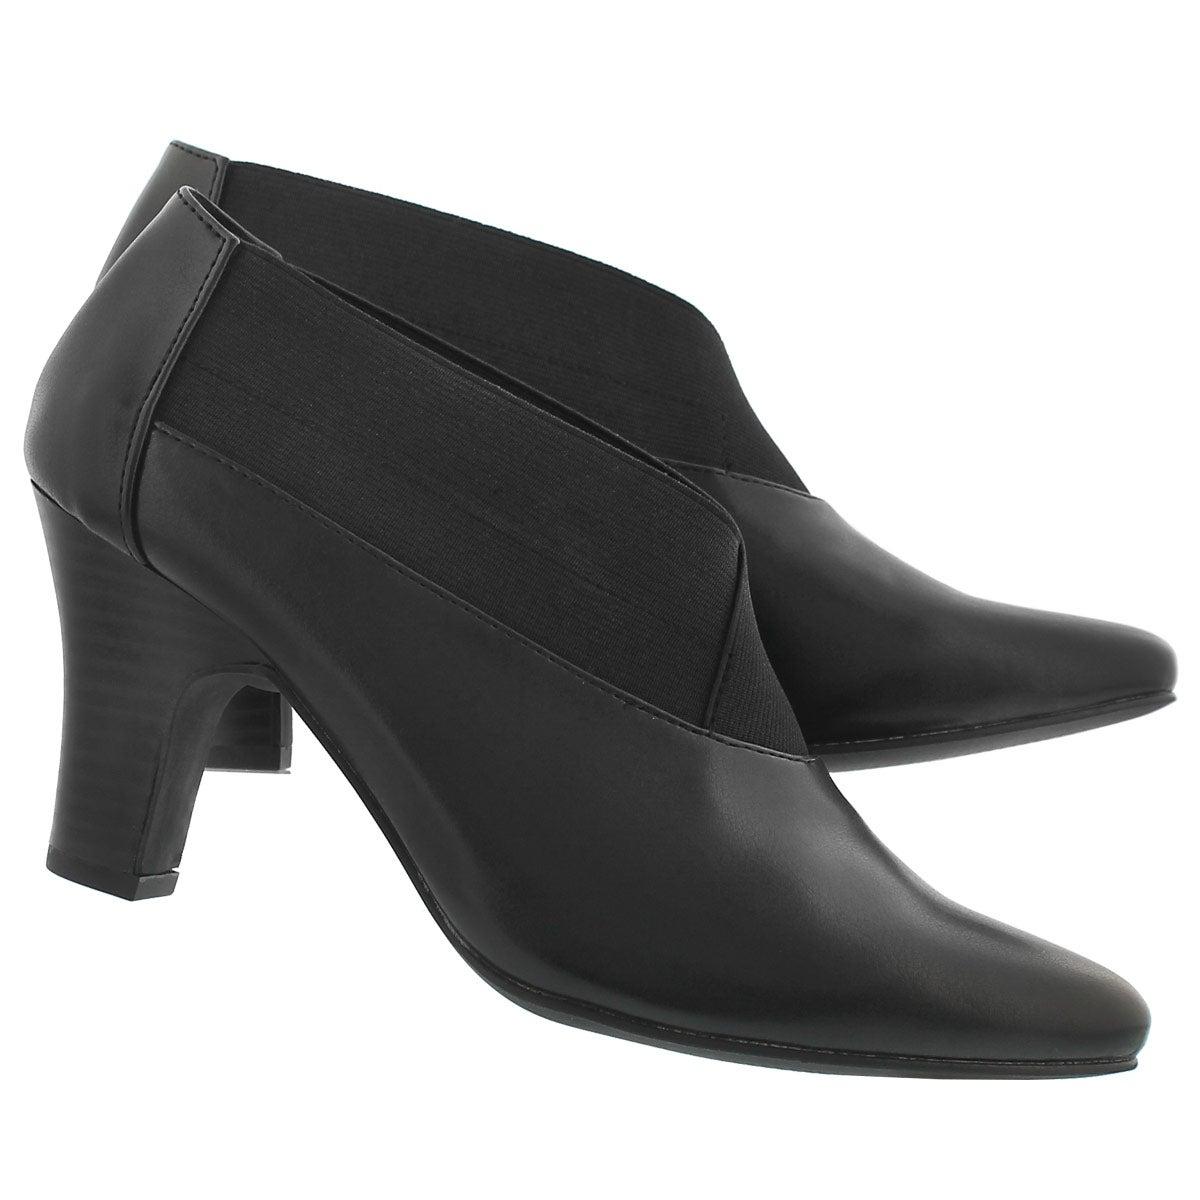 Lds Damie blk slip on dress heel